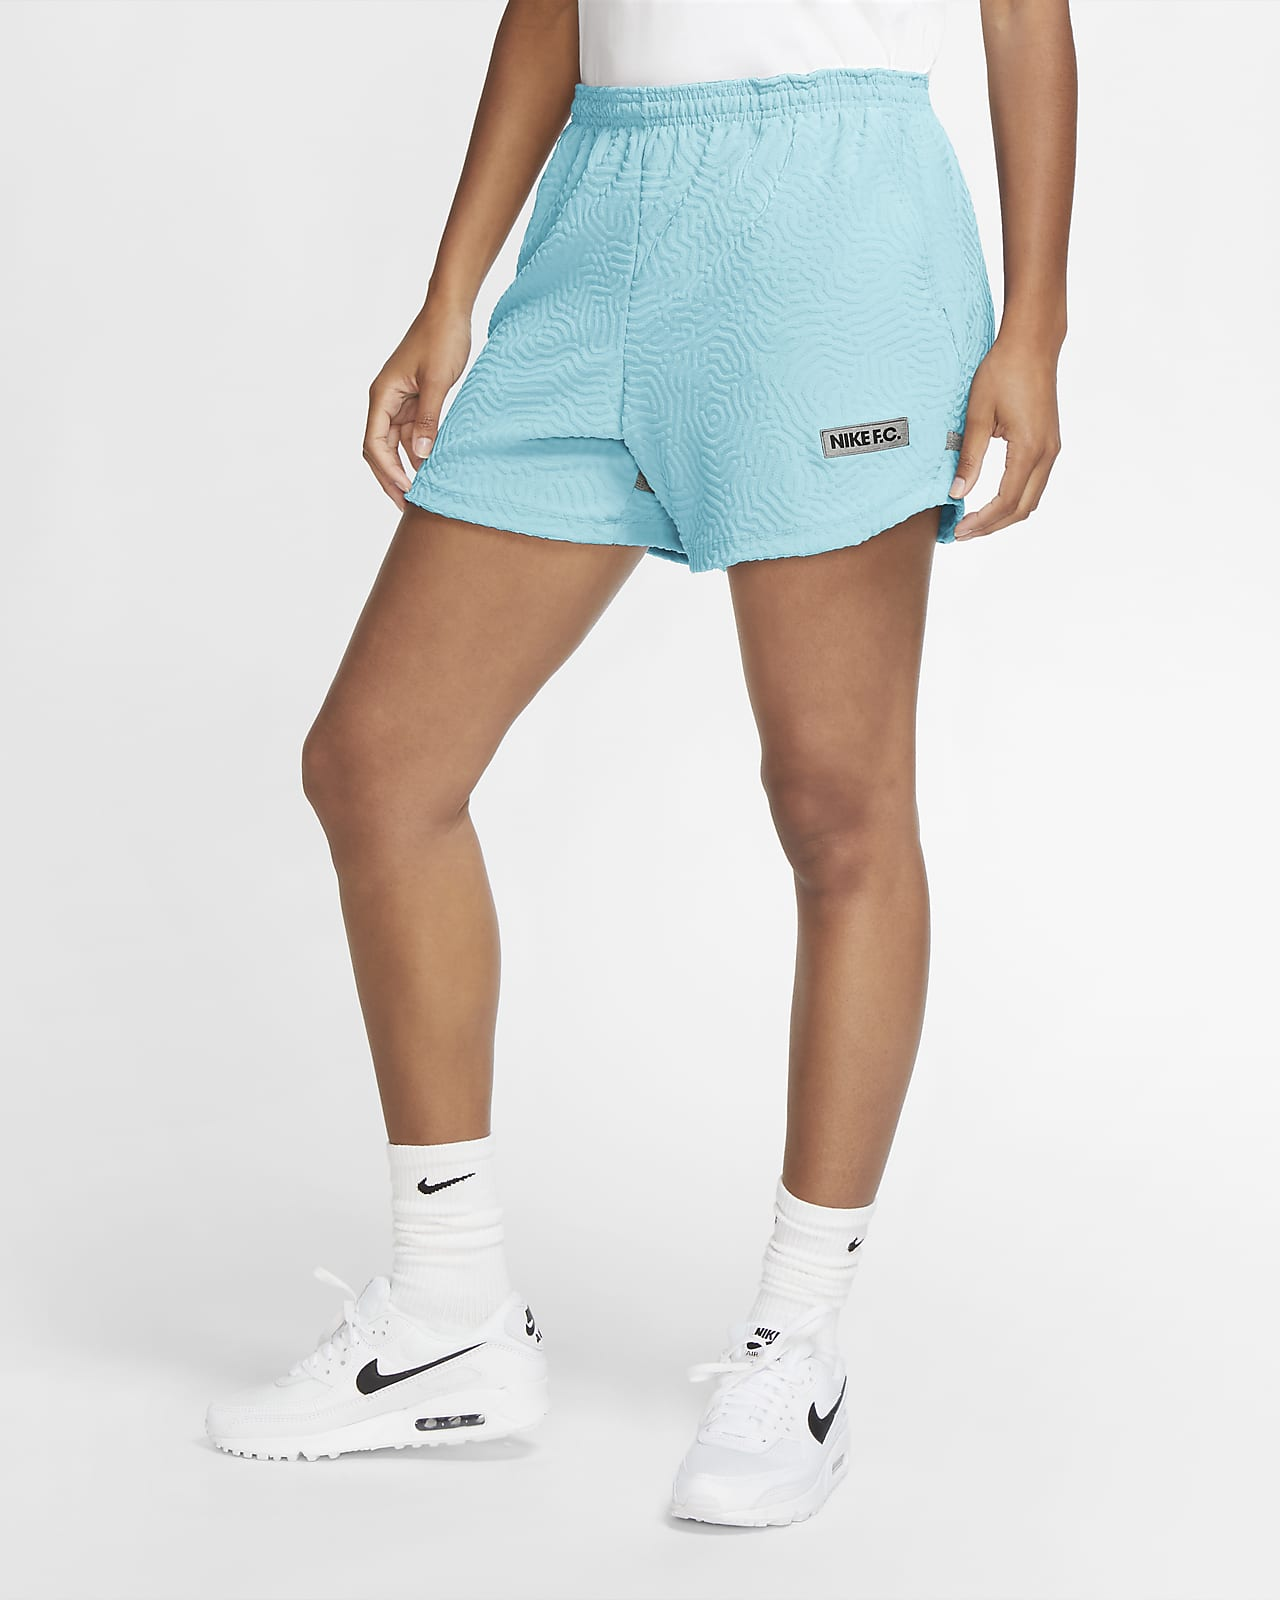 Nike F.C. Women's Football Track Shorts